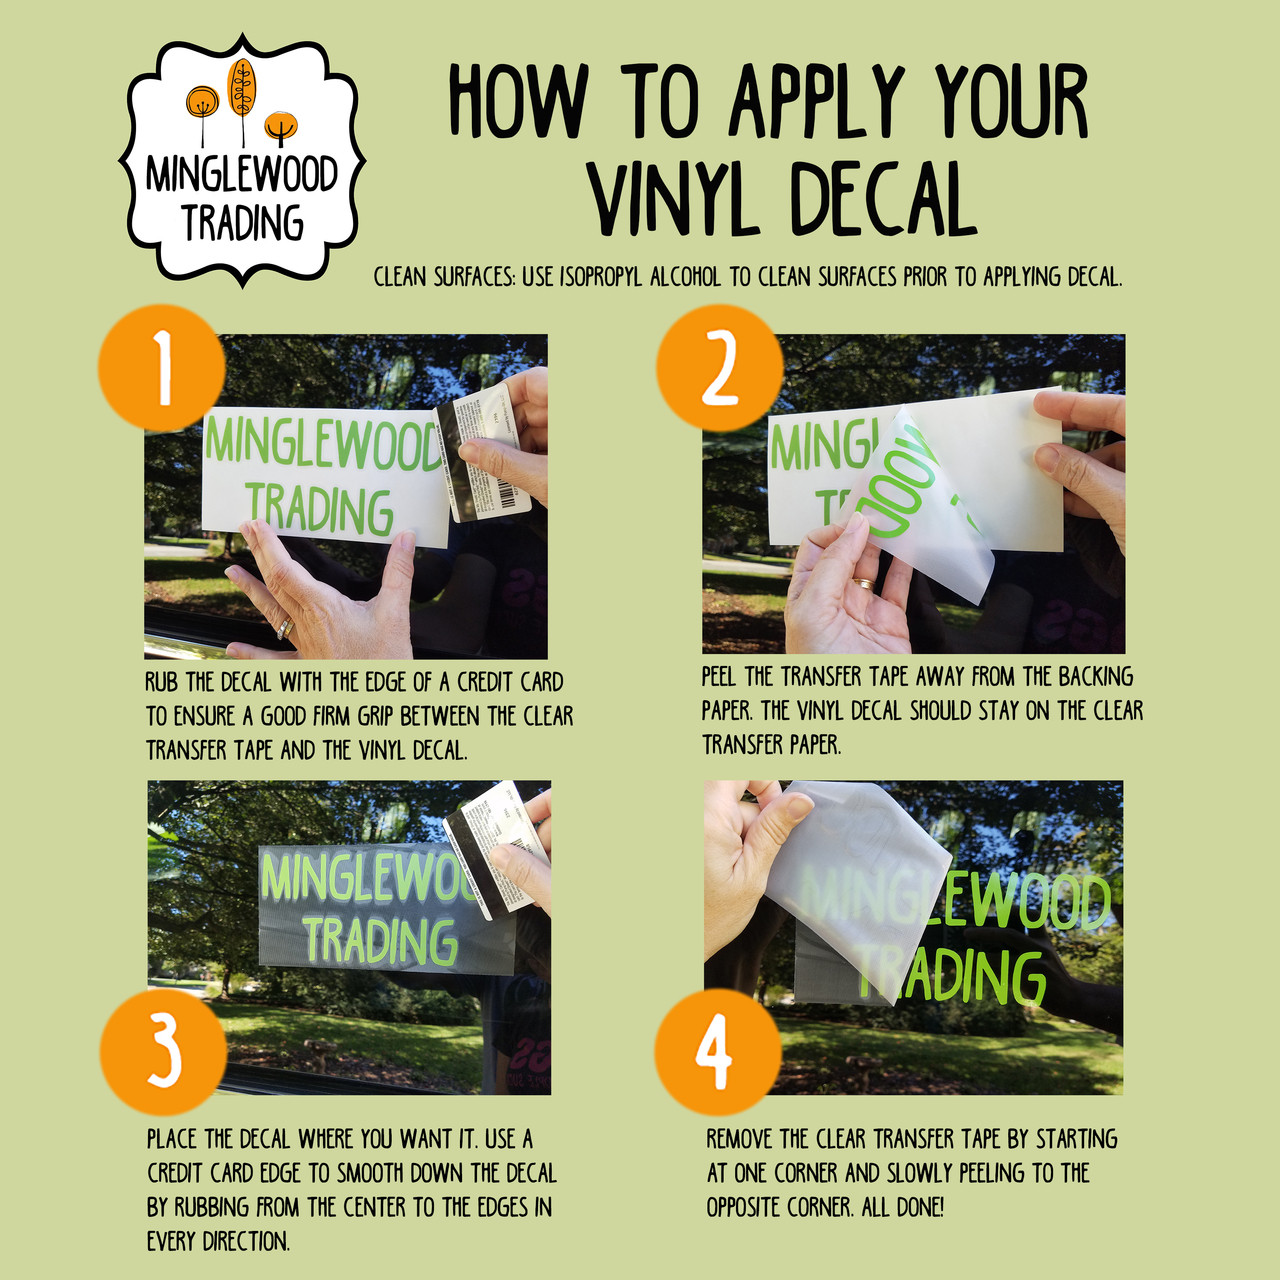 VIKING AXE Vinyl Decal - Bearded Dane Skeggox Battle Hafted English Long Axe - Die Cut Decal